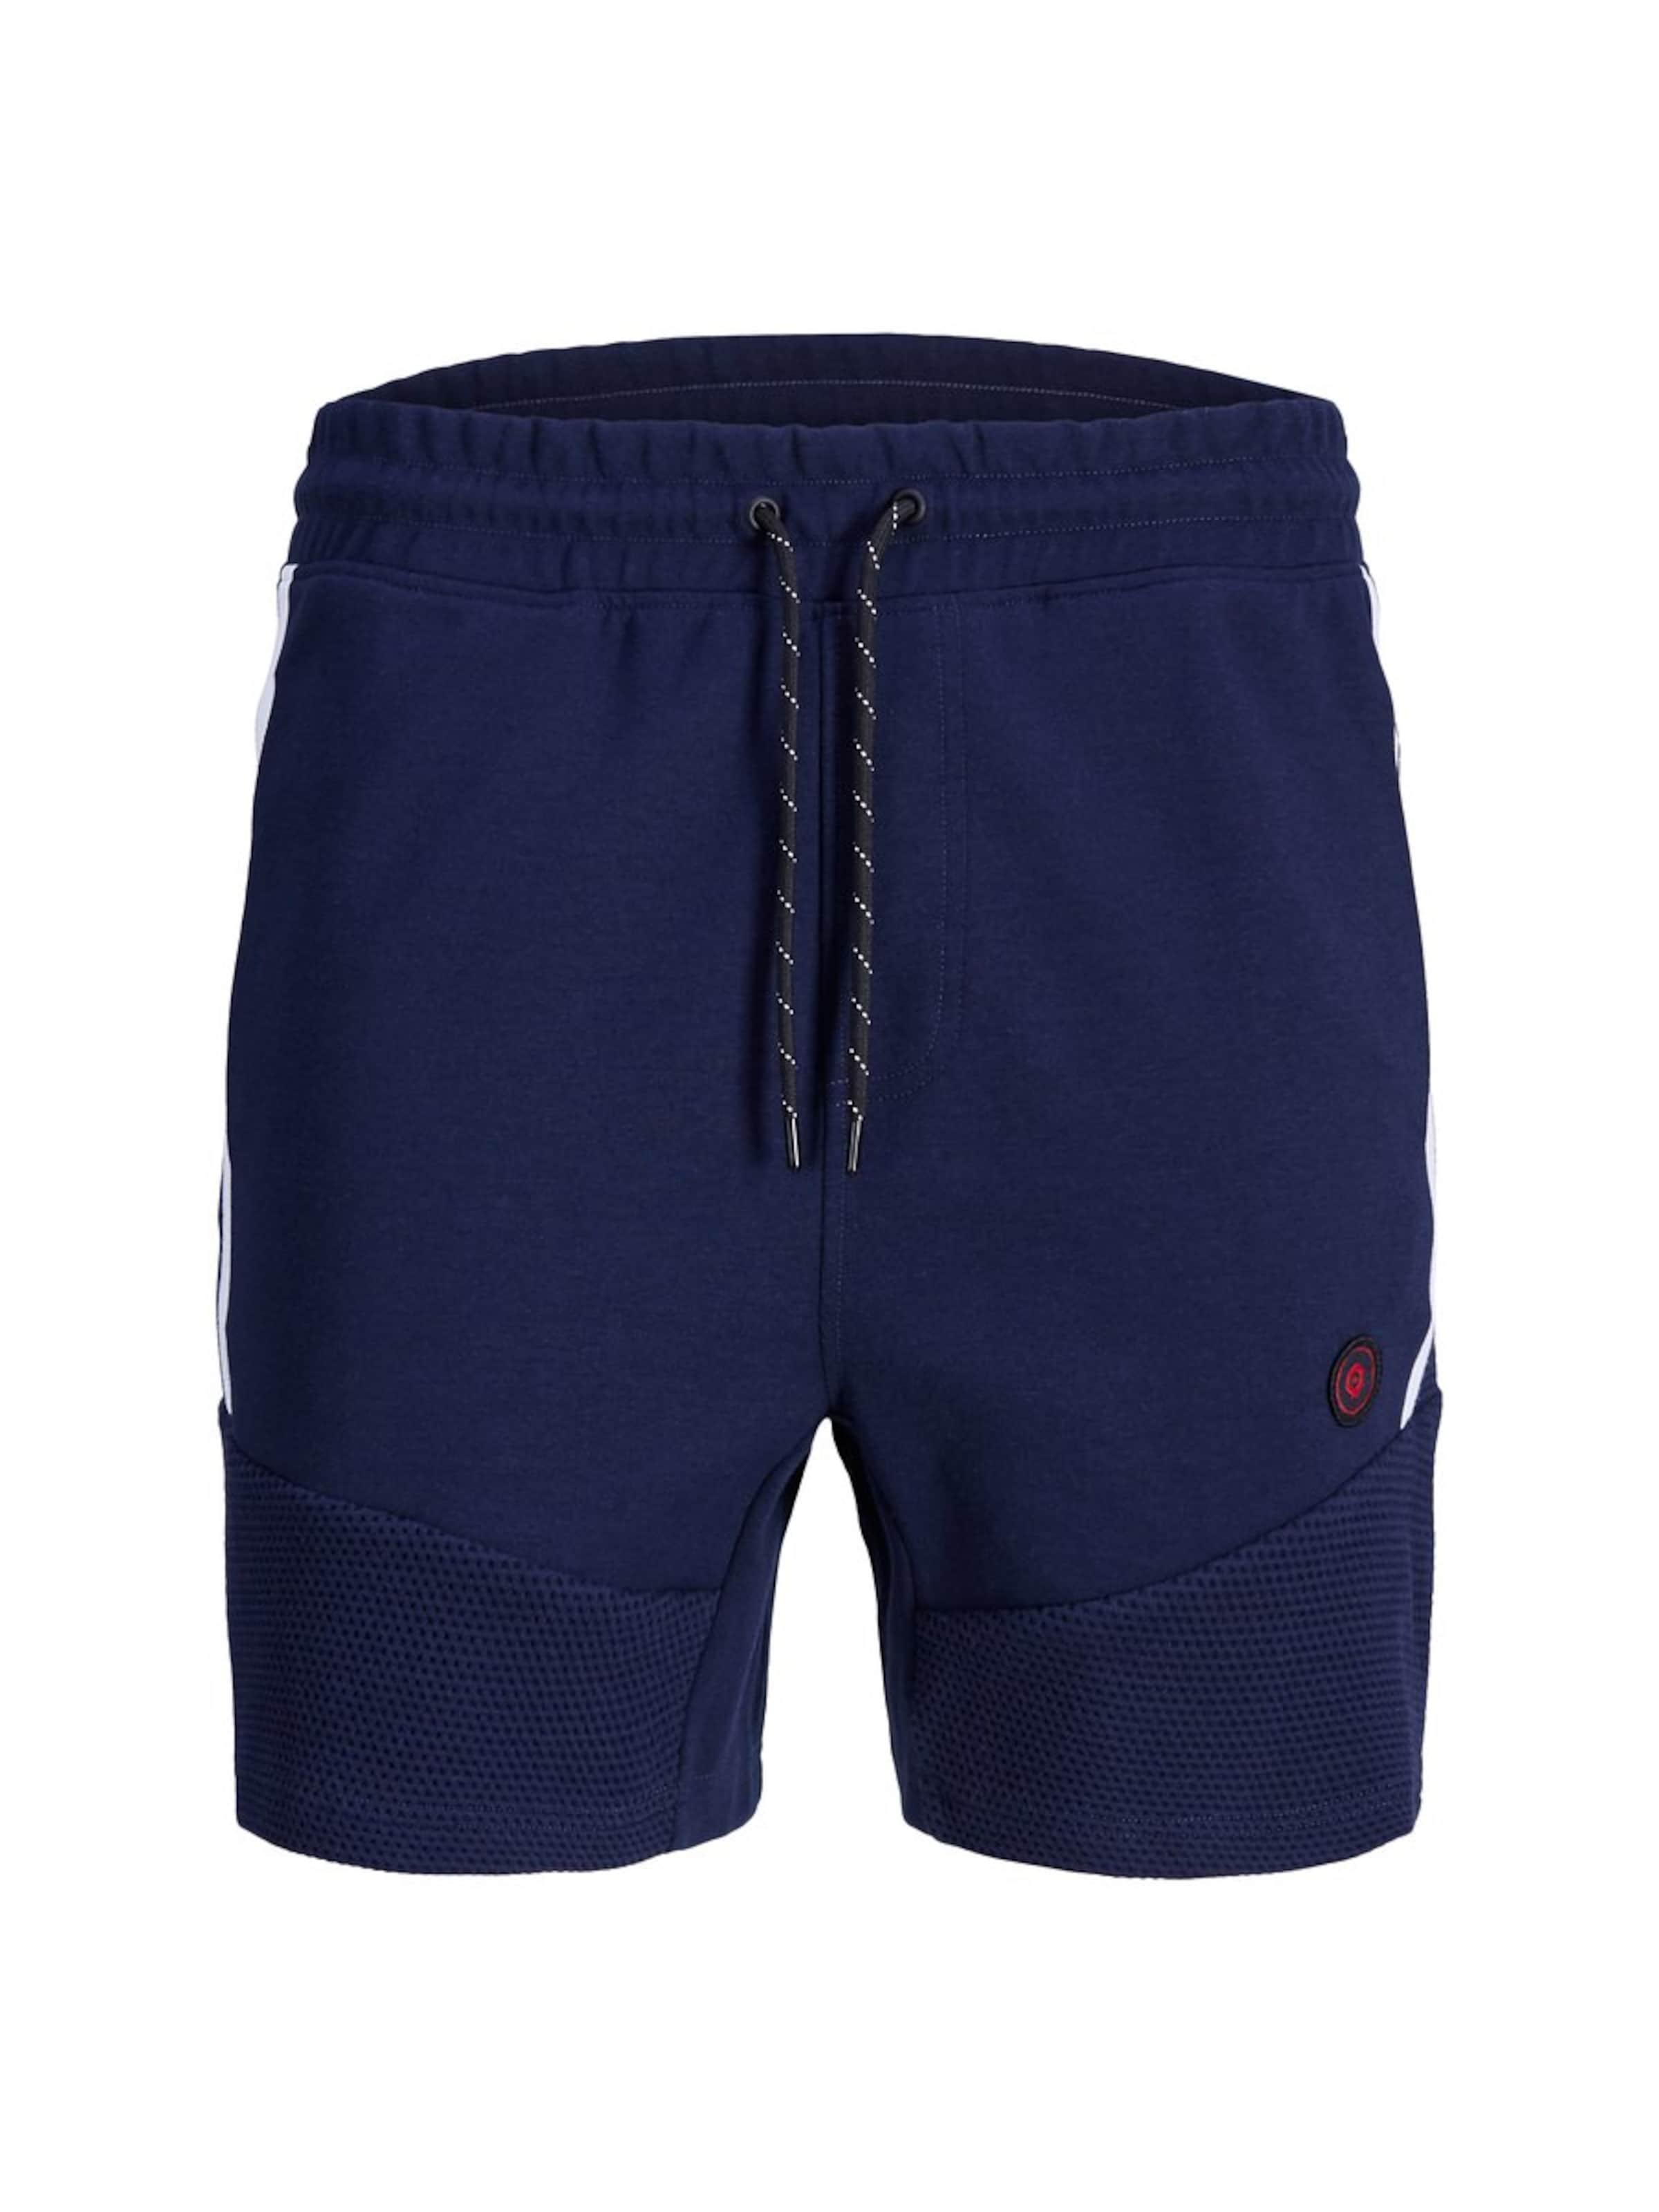 Jackamp; Jackamp; Pantalon Jones Jones En En MarineBlanc Jackamp; Pantalon MarineBlanc nm0N8w